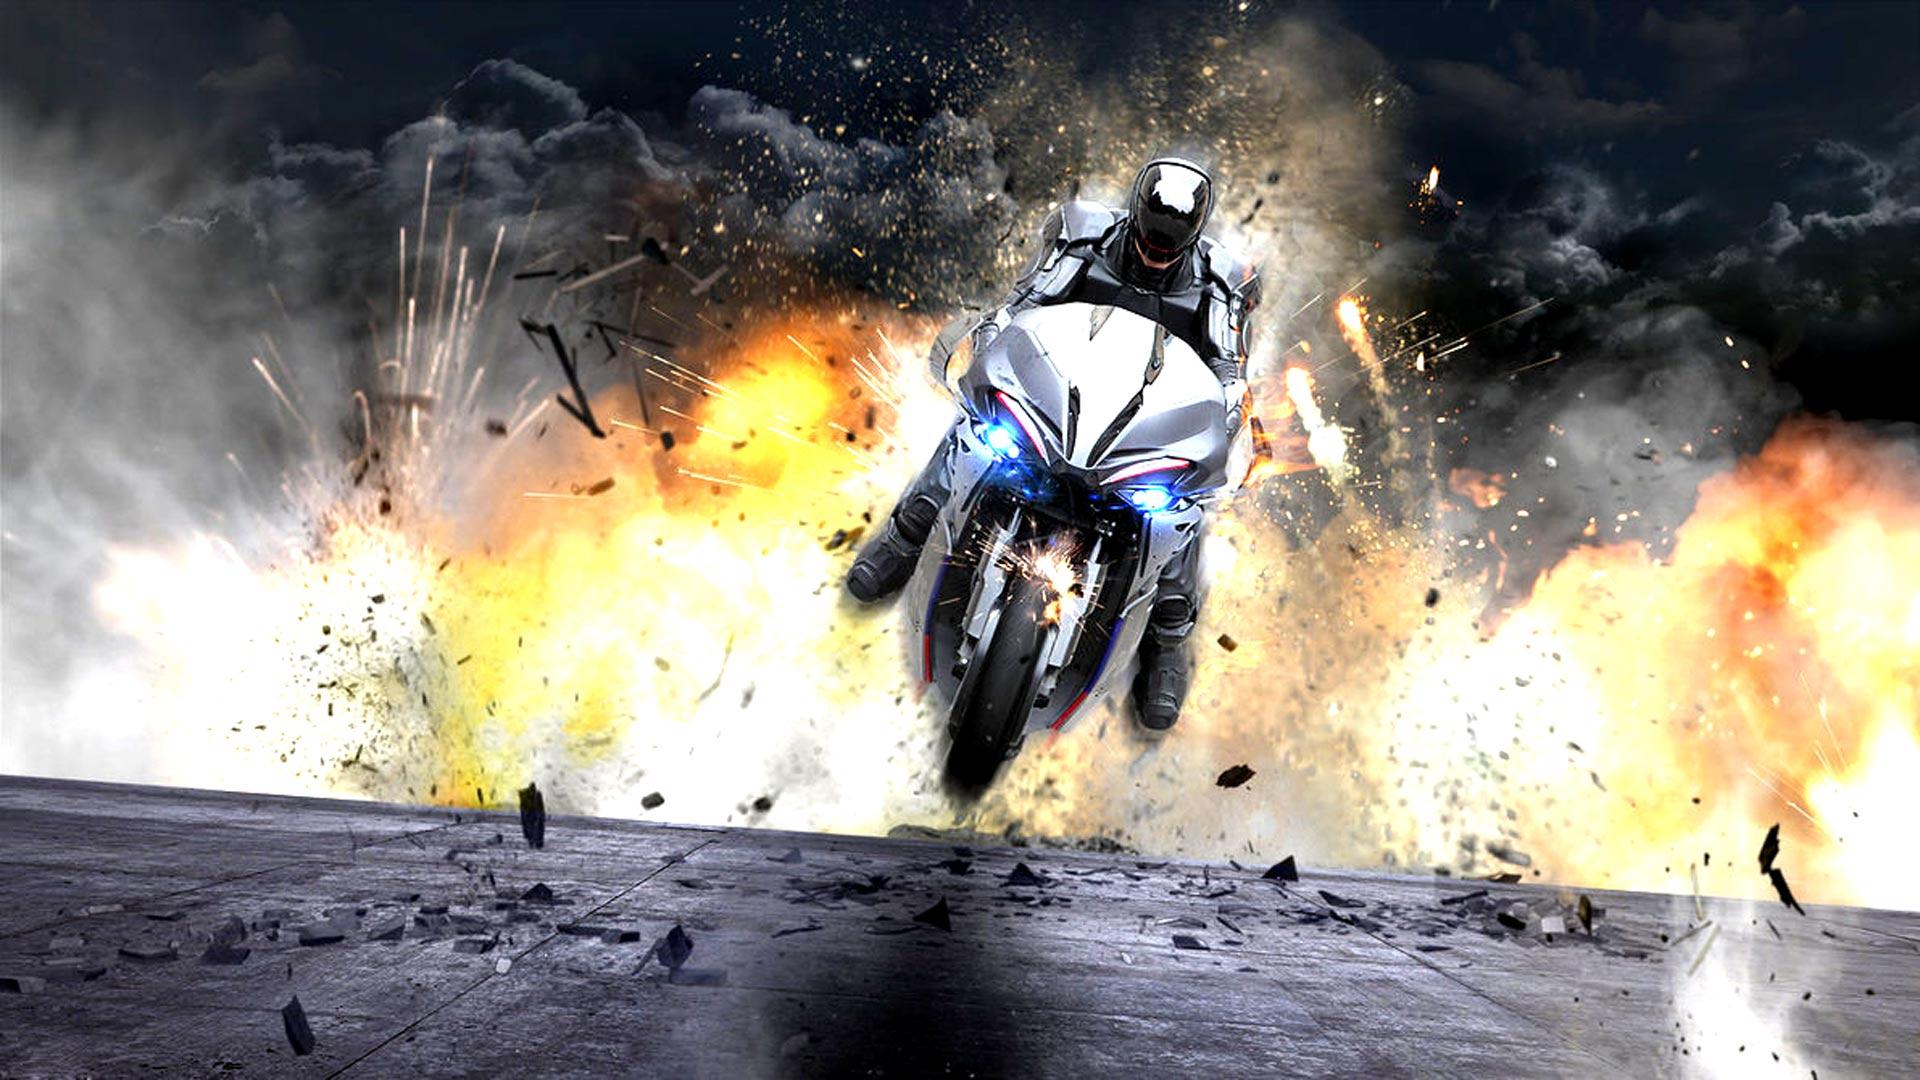 download action movies wallpaper -#main